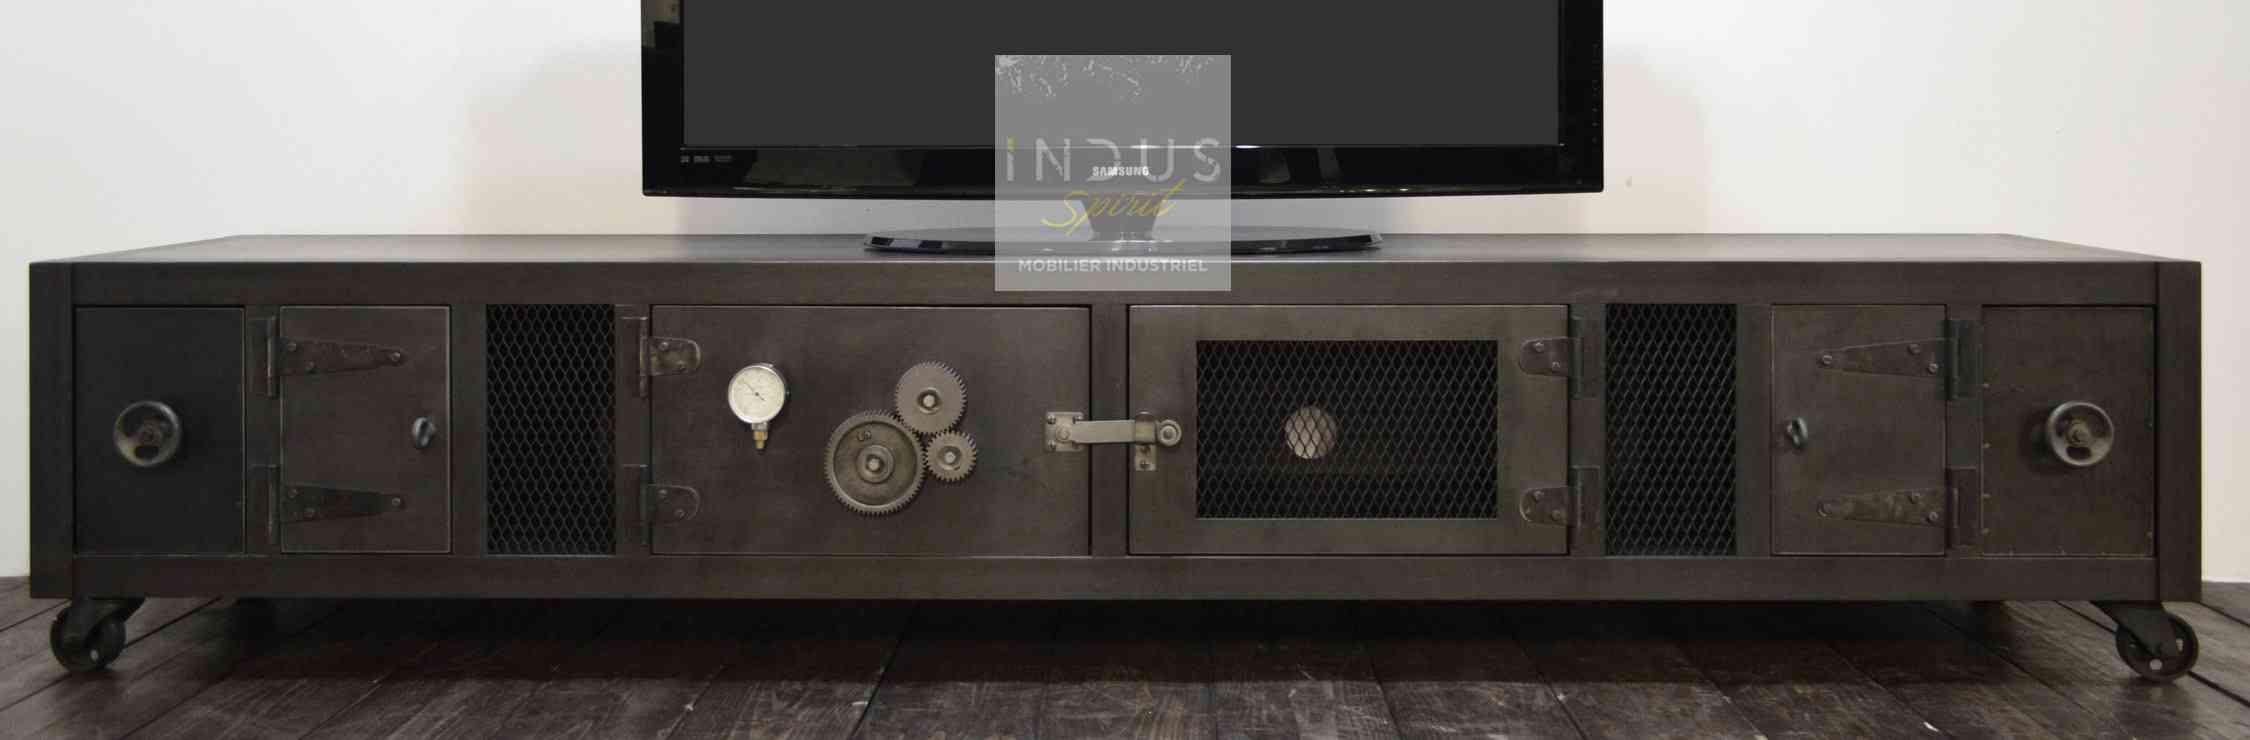 meuble-TV-industriel-XXL.jpg